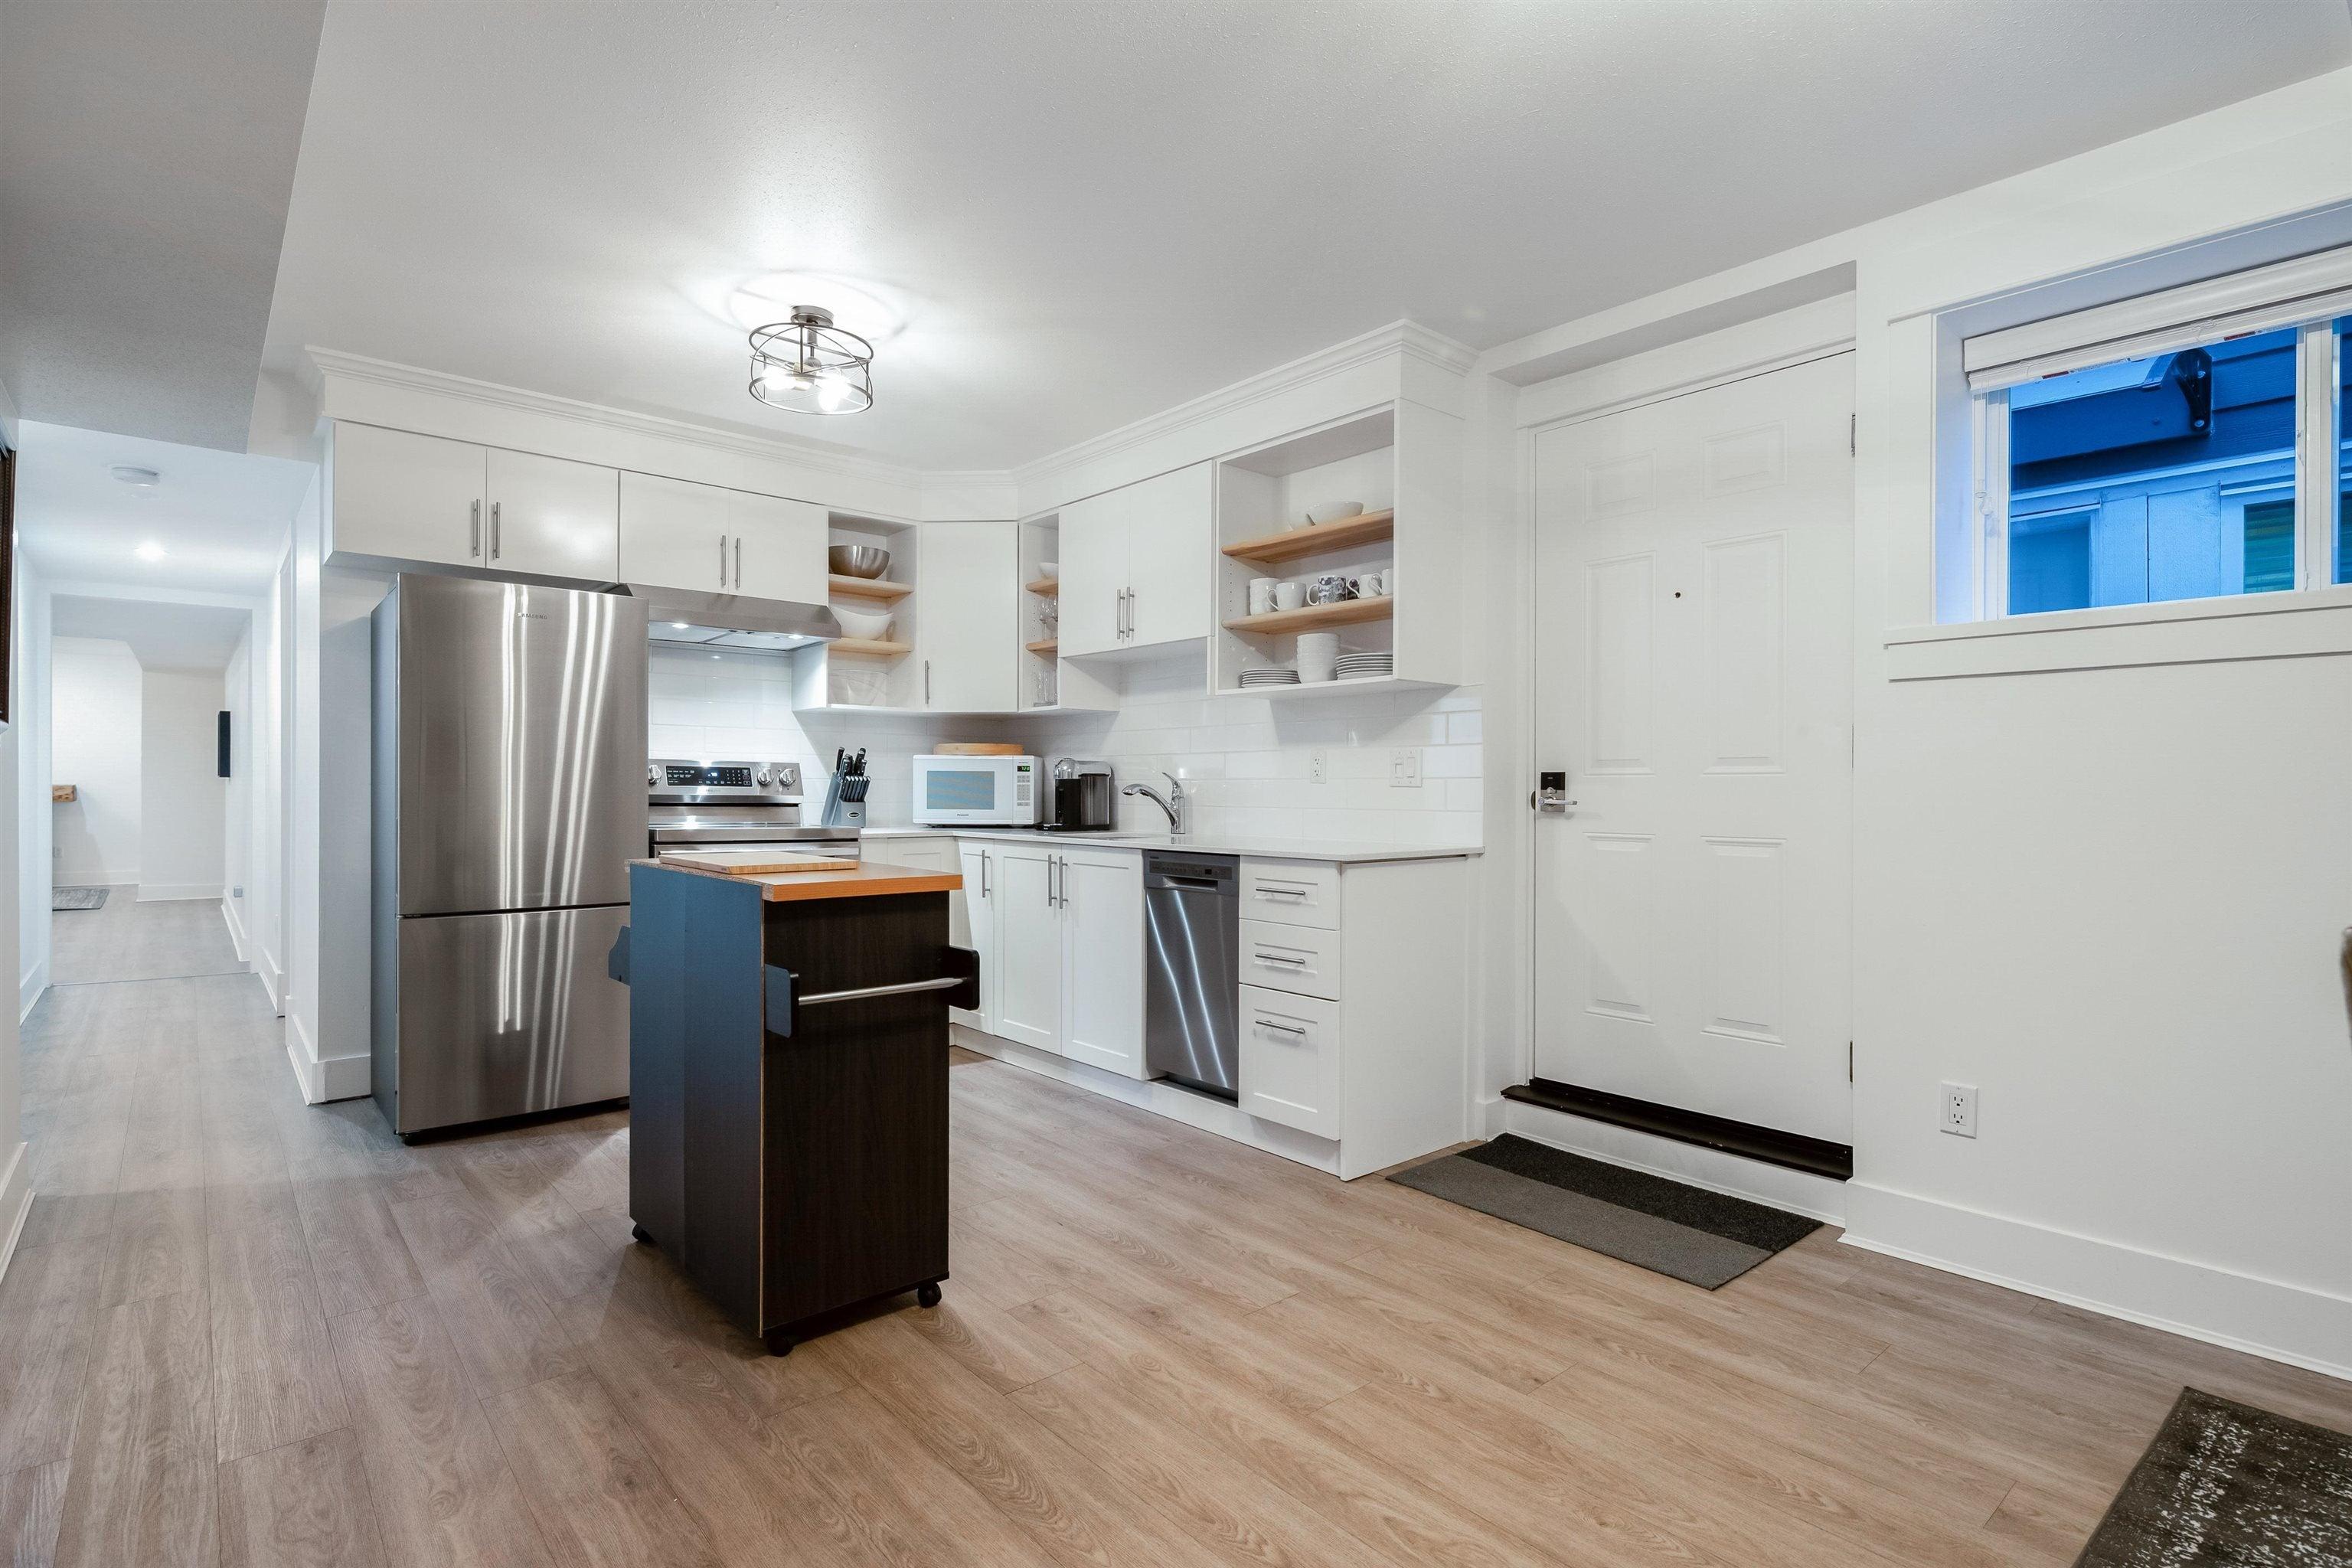 2258 WINDRIDGE DRIVE - Seymour NV House/Single Family for sale, 5 Bedrooms (R2617156) - #31